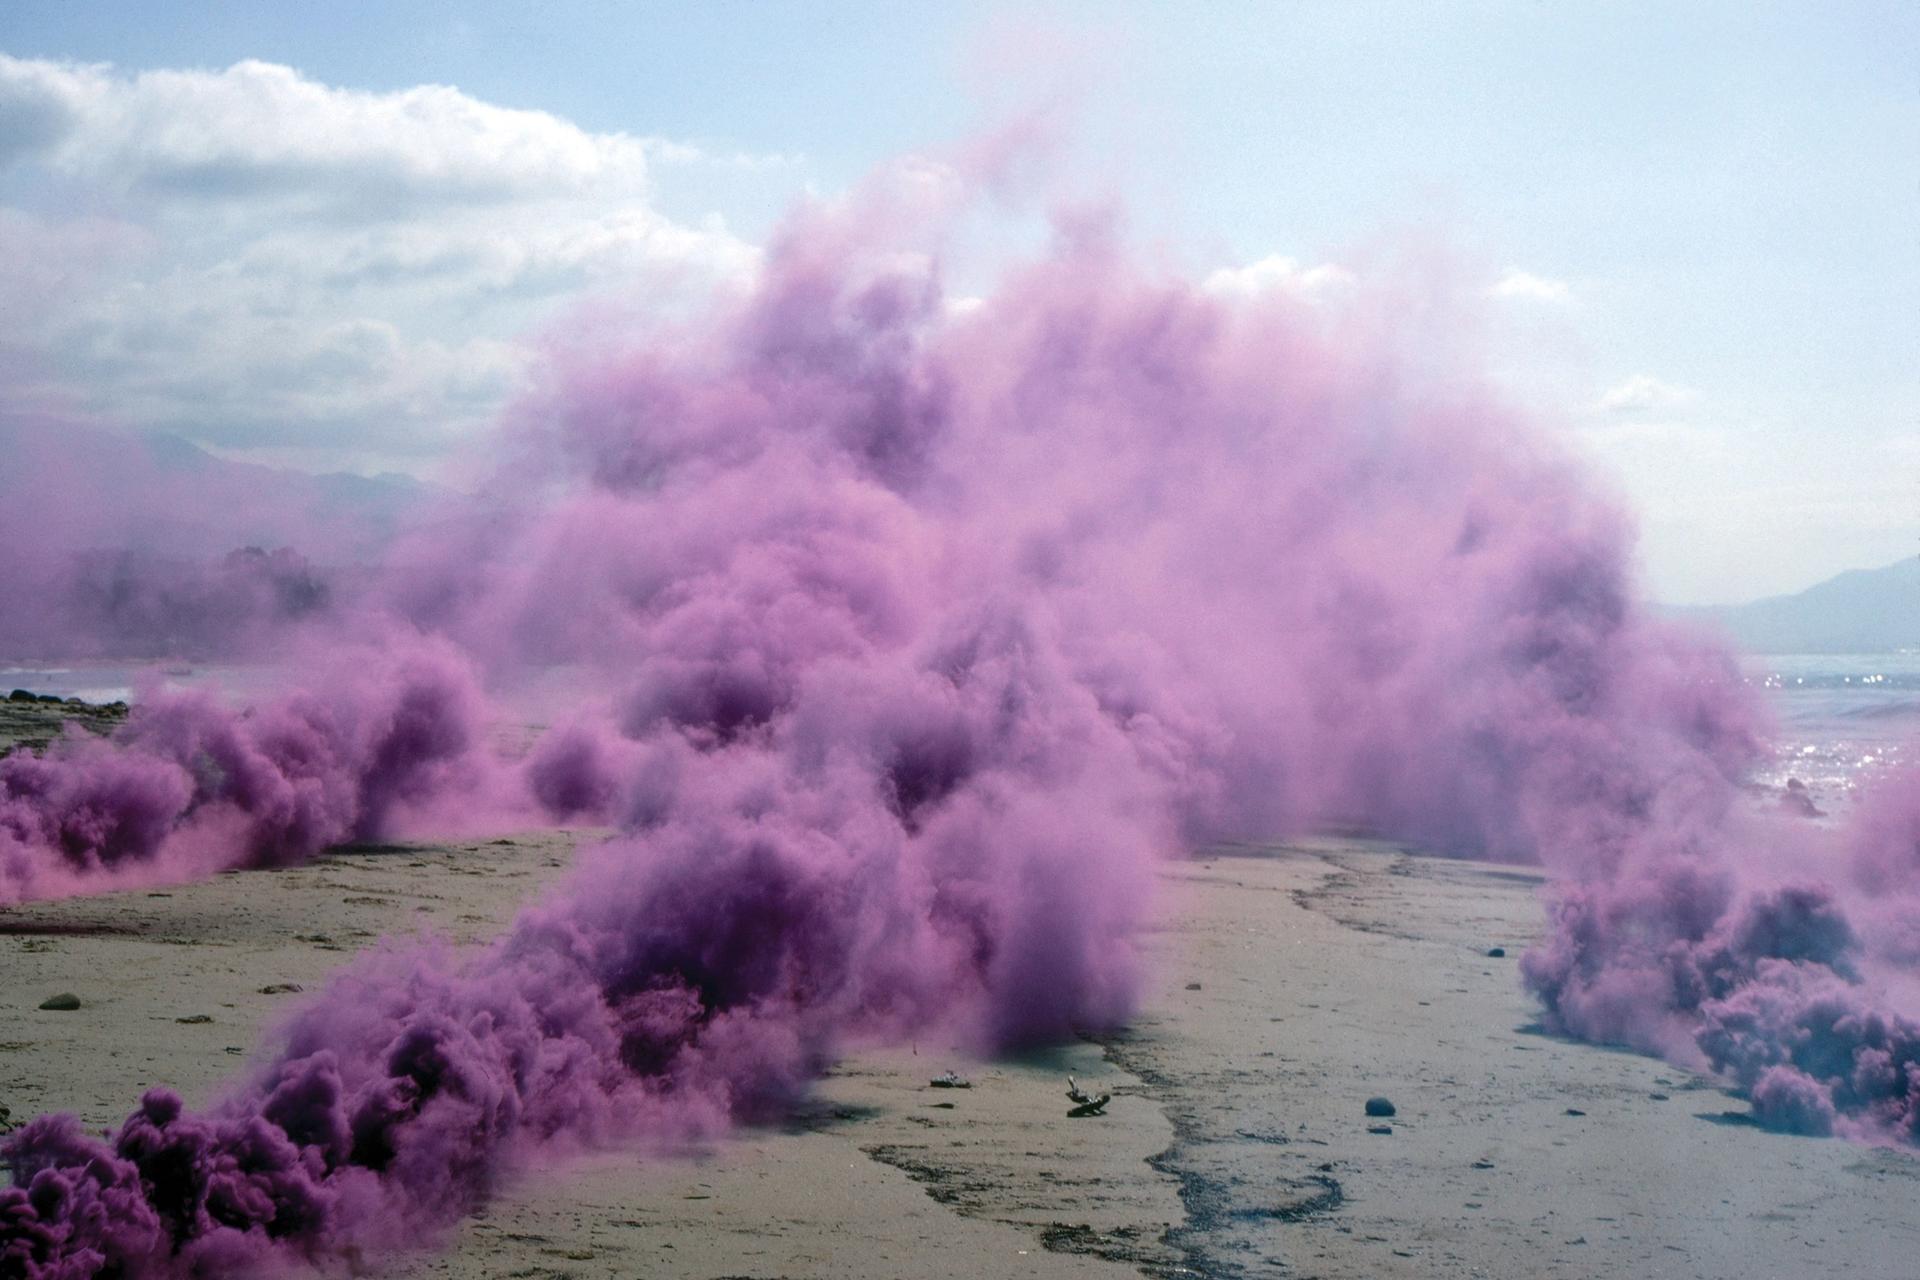 Rendering for Living Smoke: A Tribute to the Living Desert by Desert X 2021 artist Judy Chicago Courtesy of the artist and Desert X